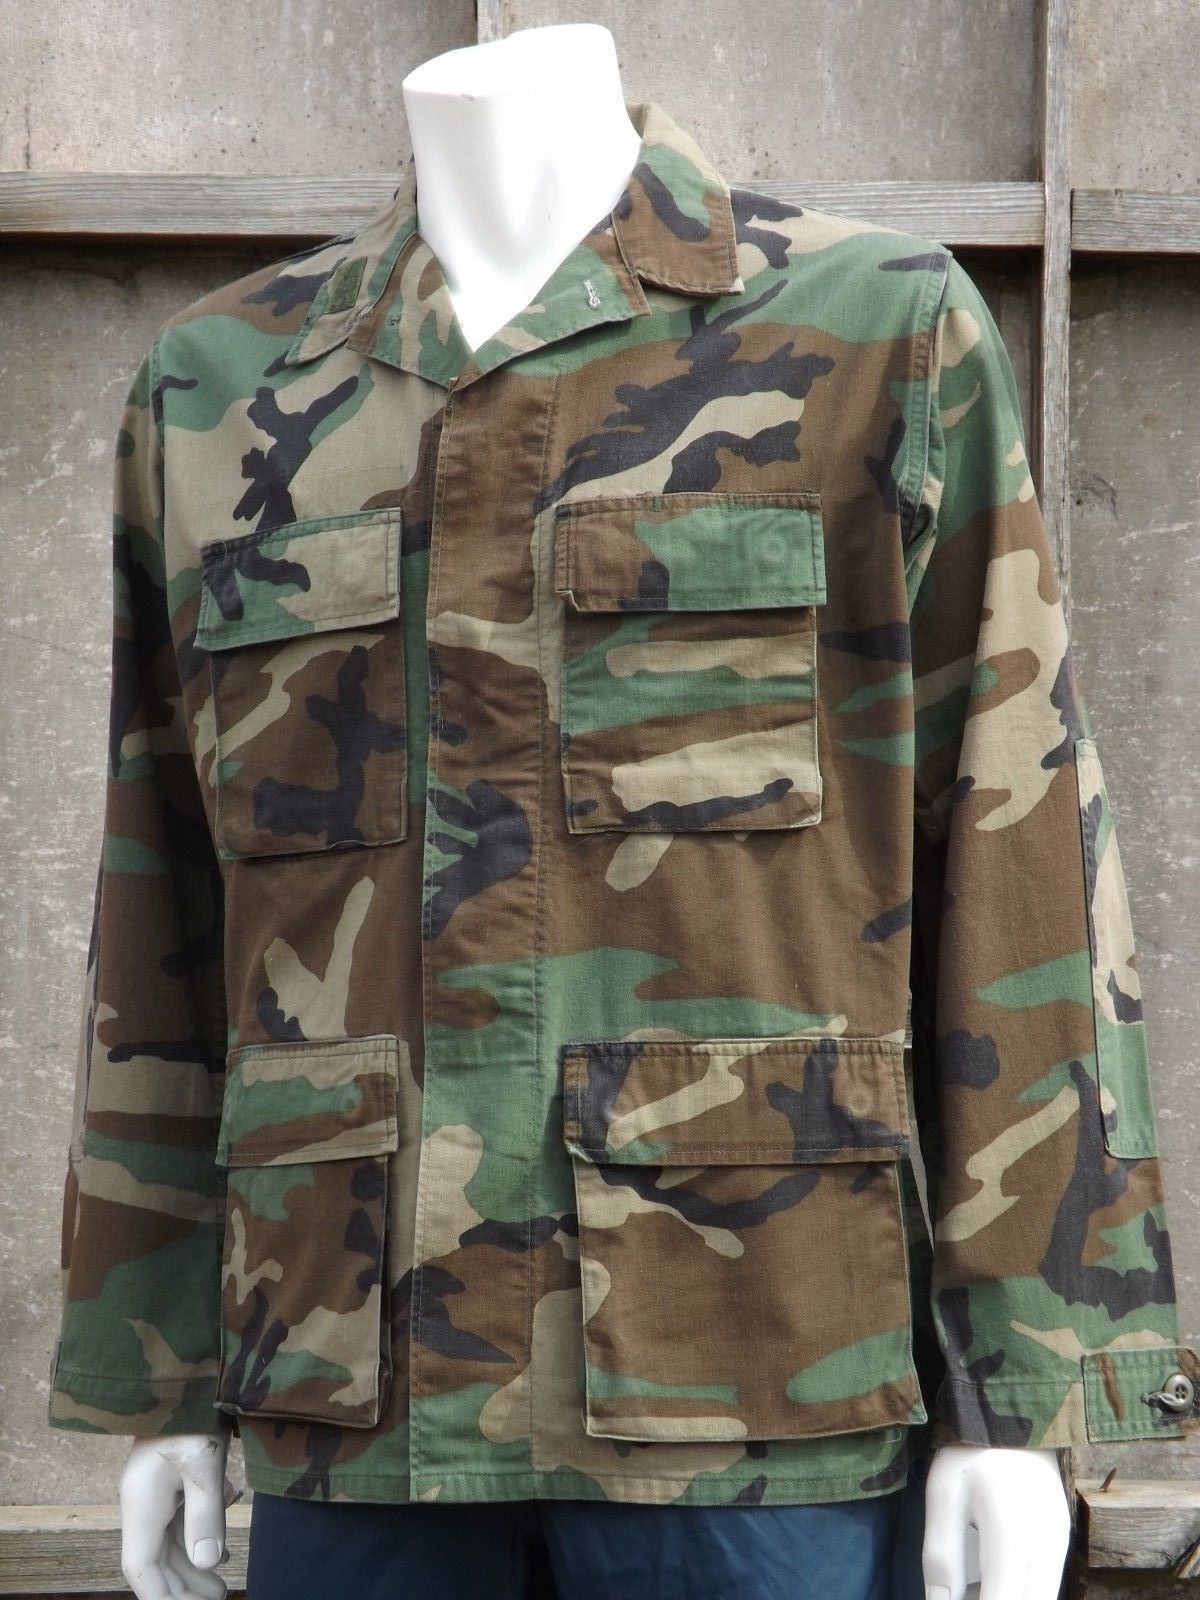 b3258606952a8 Genuine Vintage US Army Woodland BDU Jackets Camouflage Cotton Military Camo